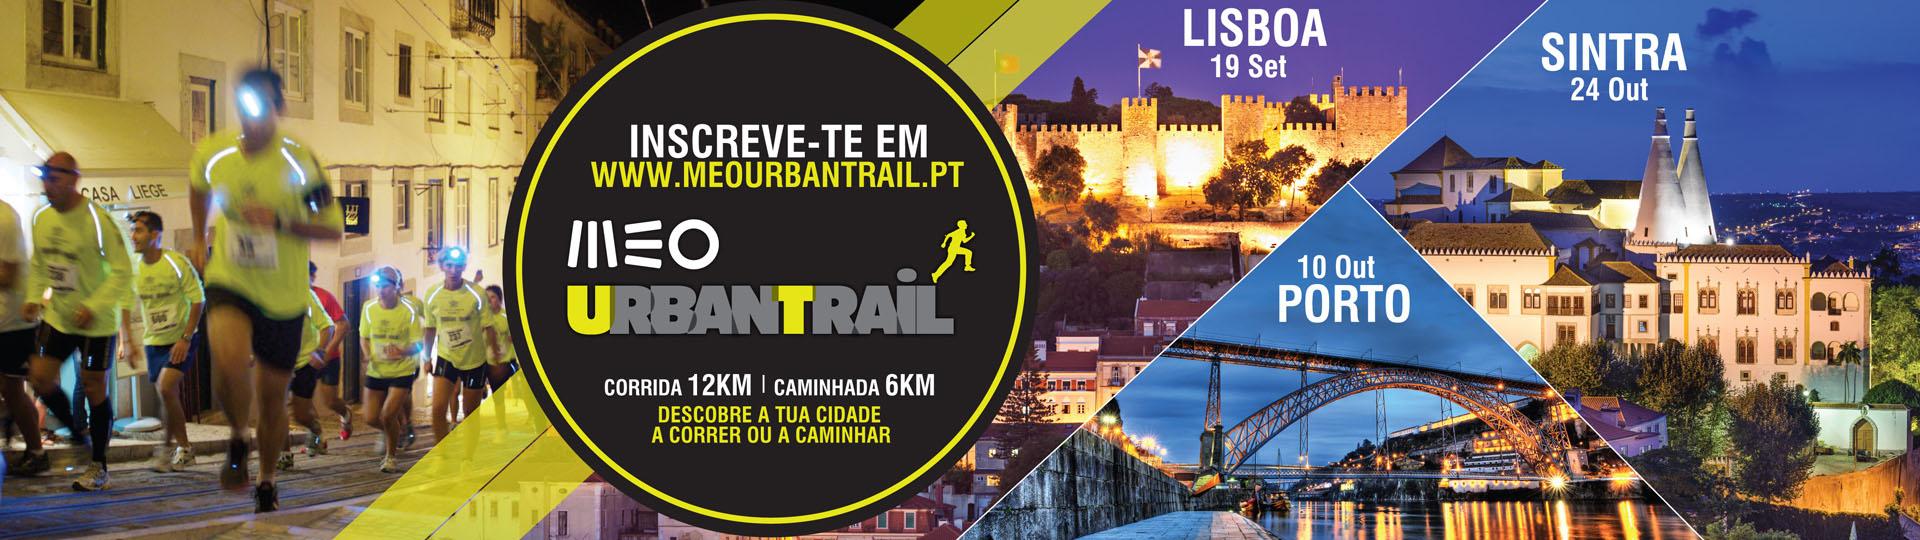 Meo UrbanTrail 2015